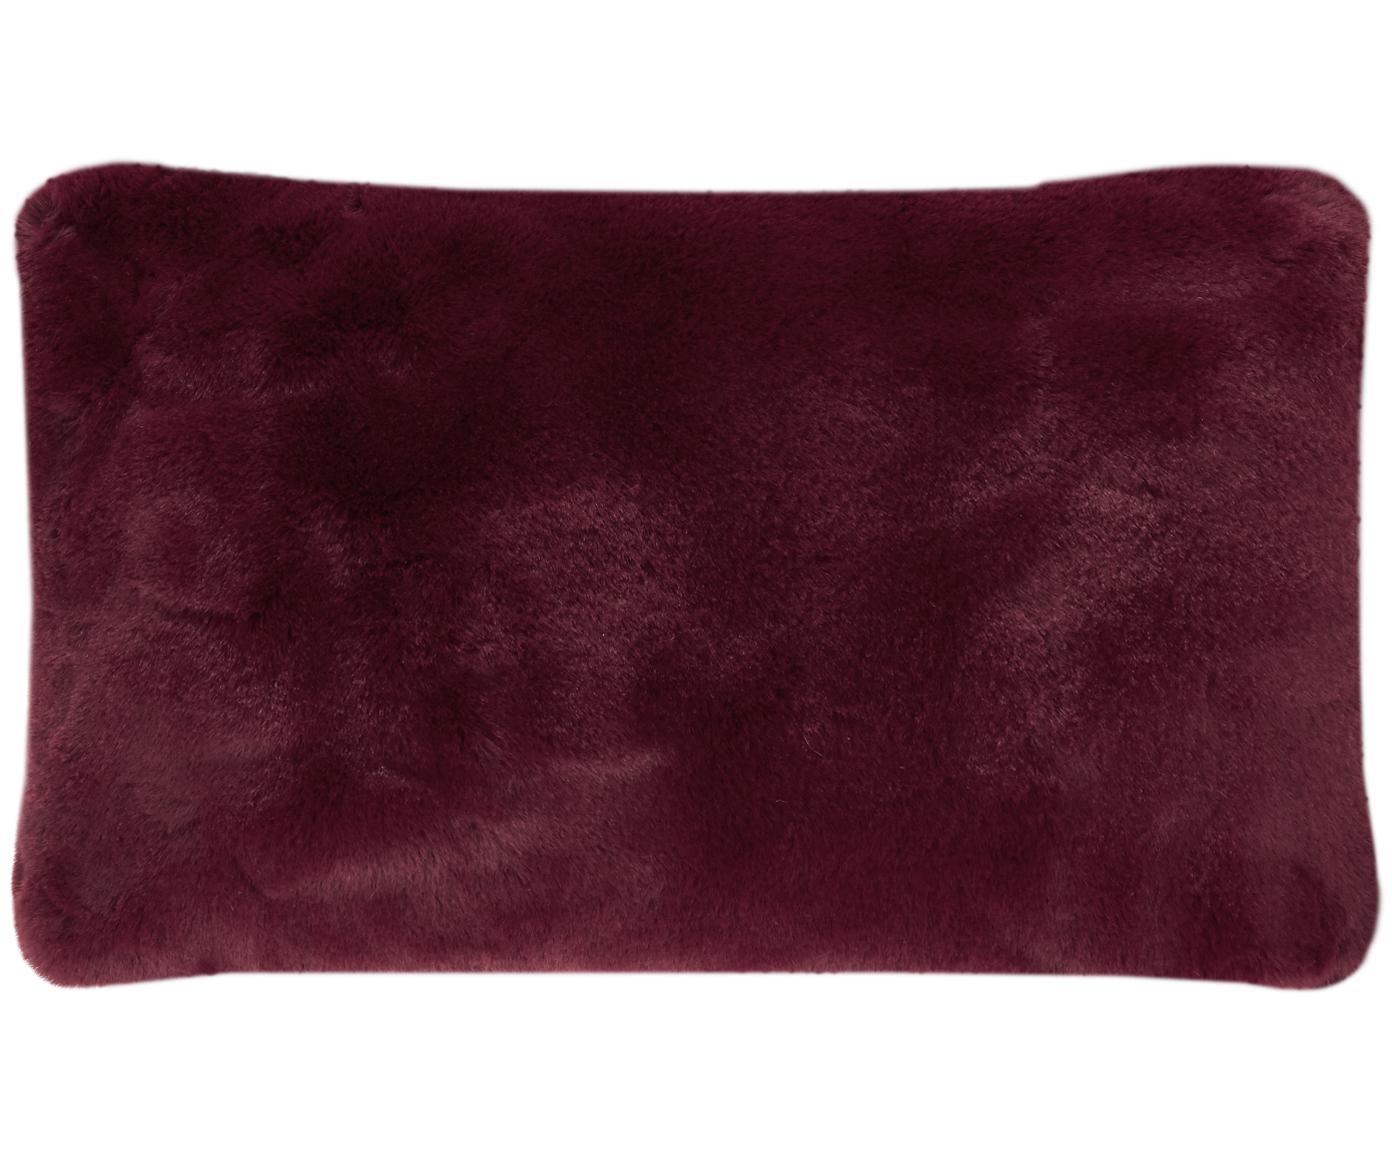 Sehr flauschige Kunstfell-Kissenhülle Mette, glatt, Vorderseite: 100% Polyester, Rückseite: 100% Polyester, Dunkelrot, 30 x 50 cm